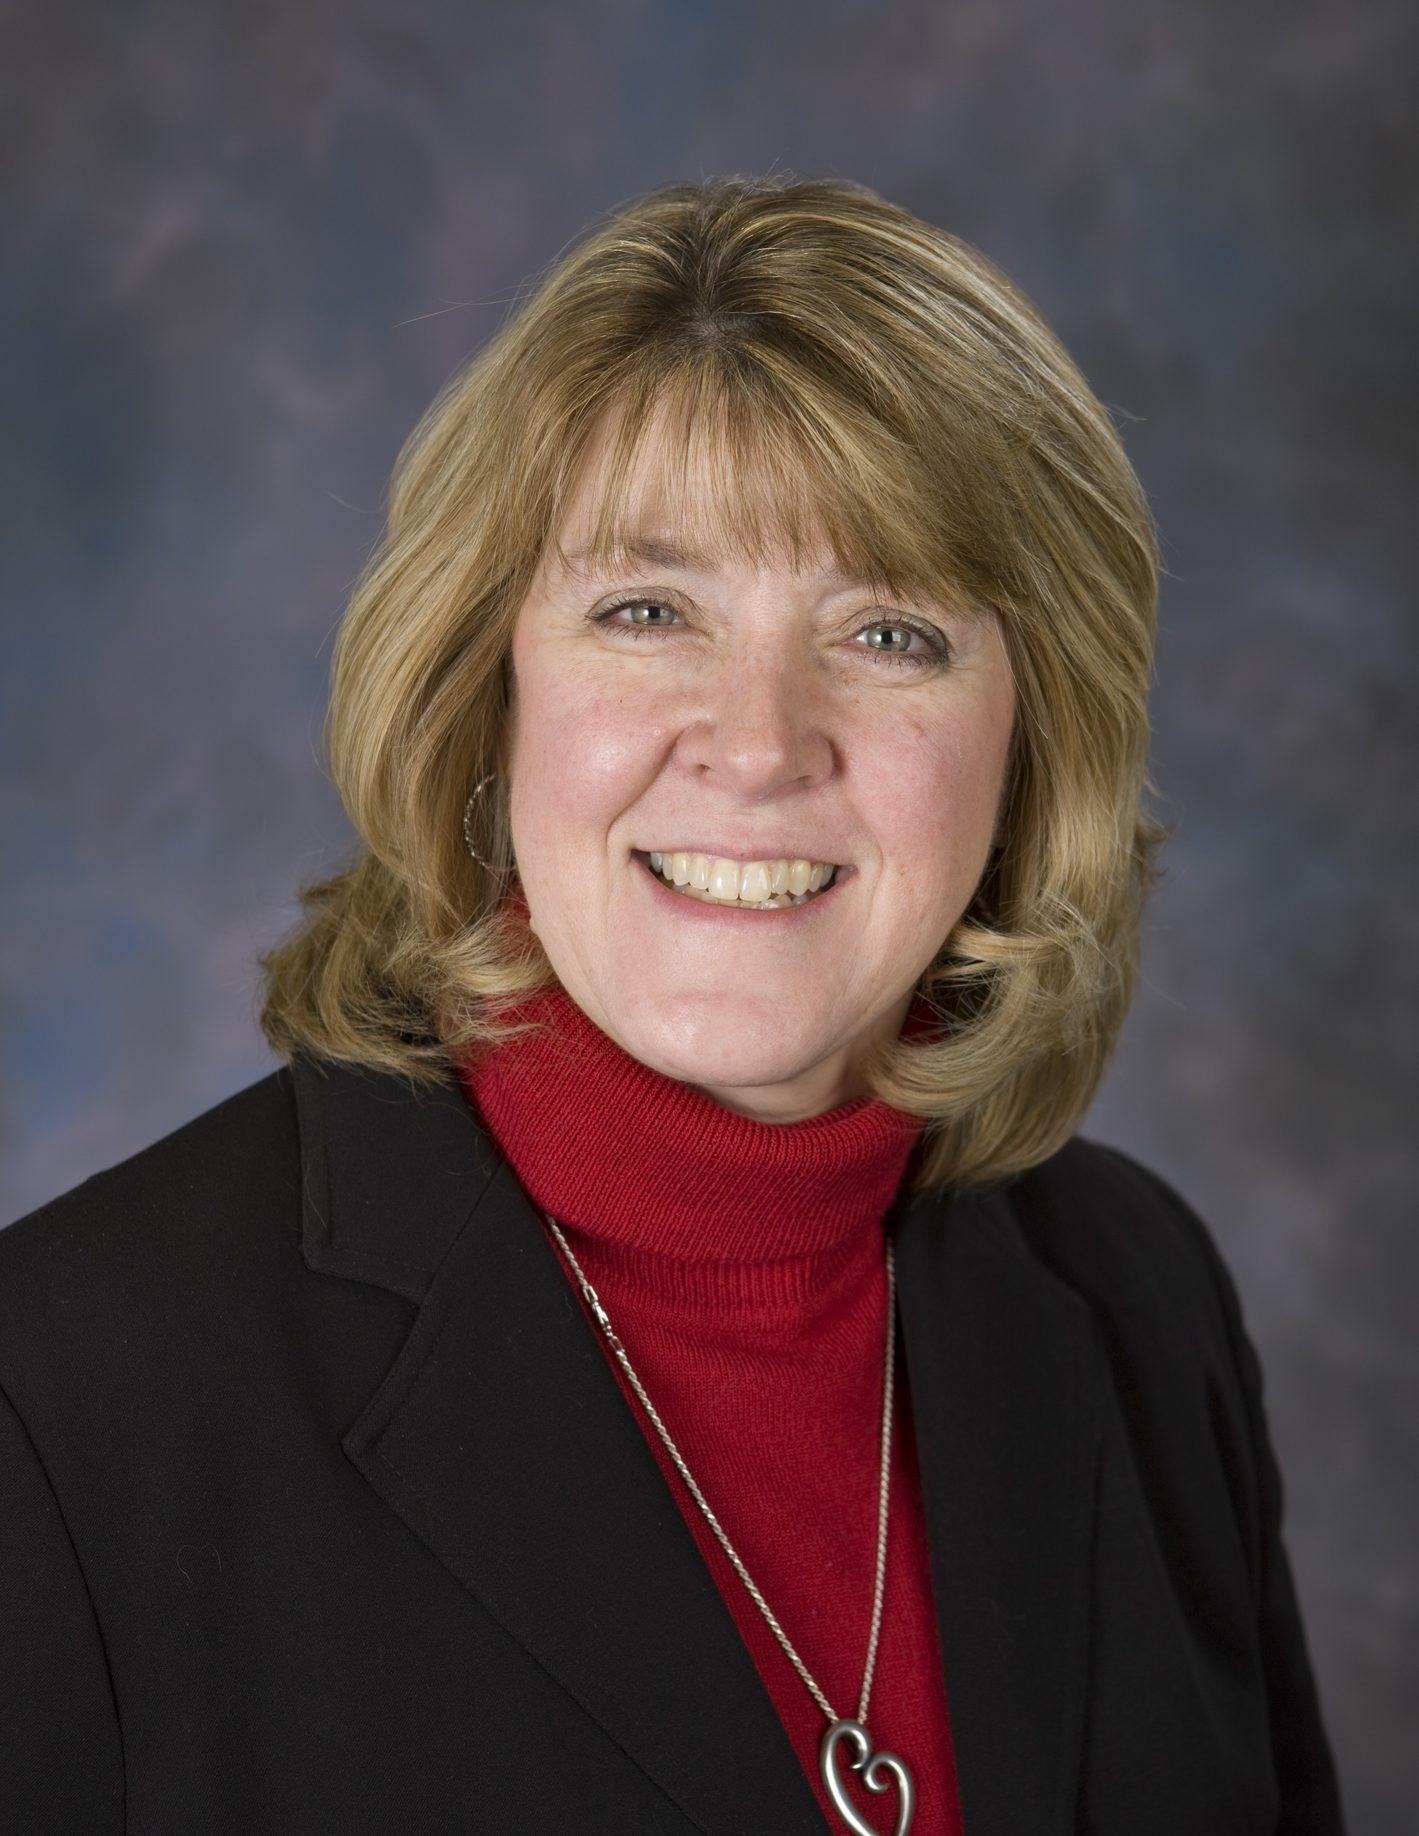 Lynette Rogers Sigma Xi Ohio State